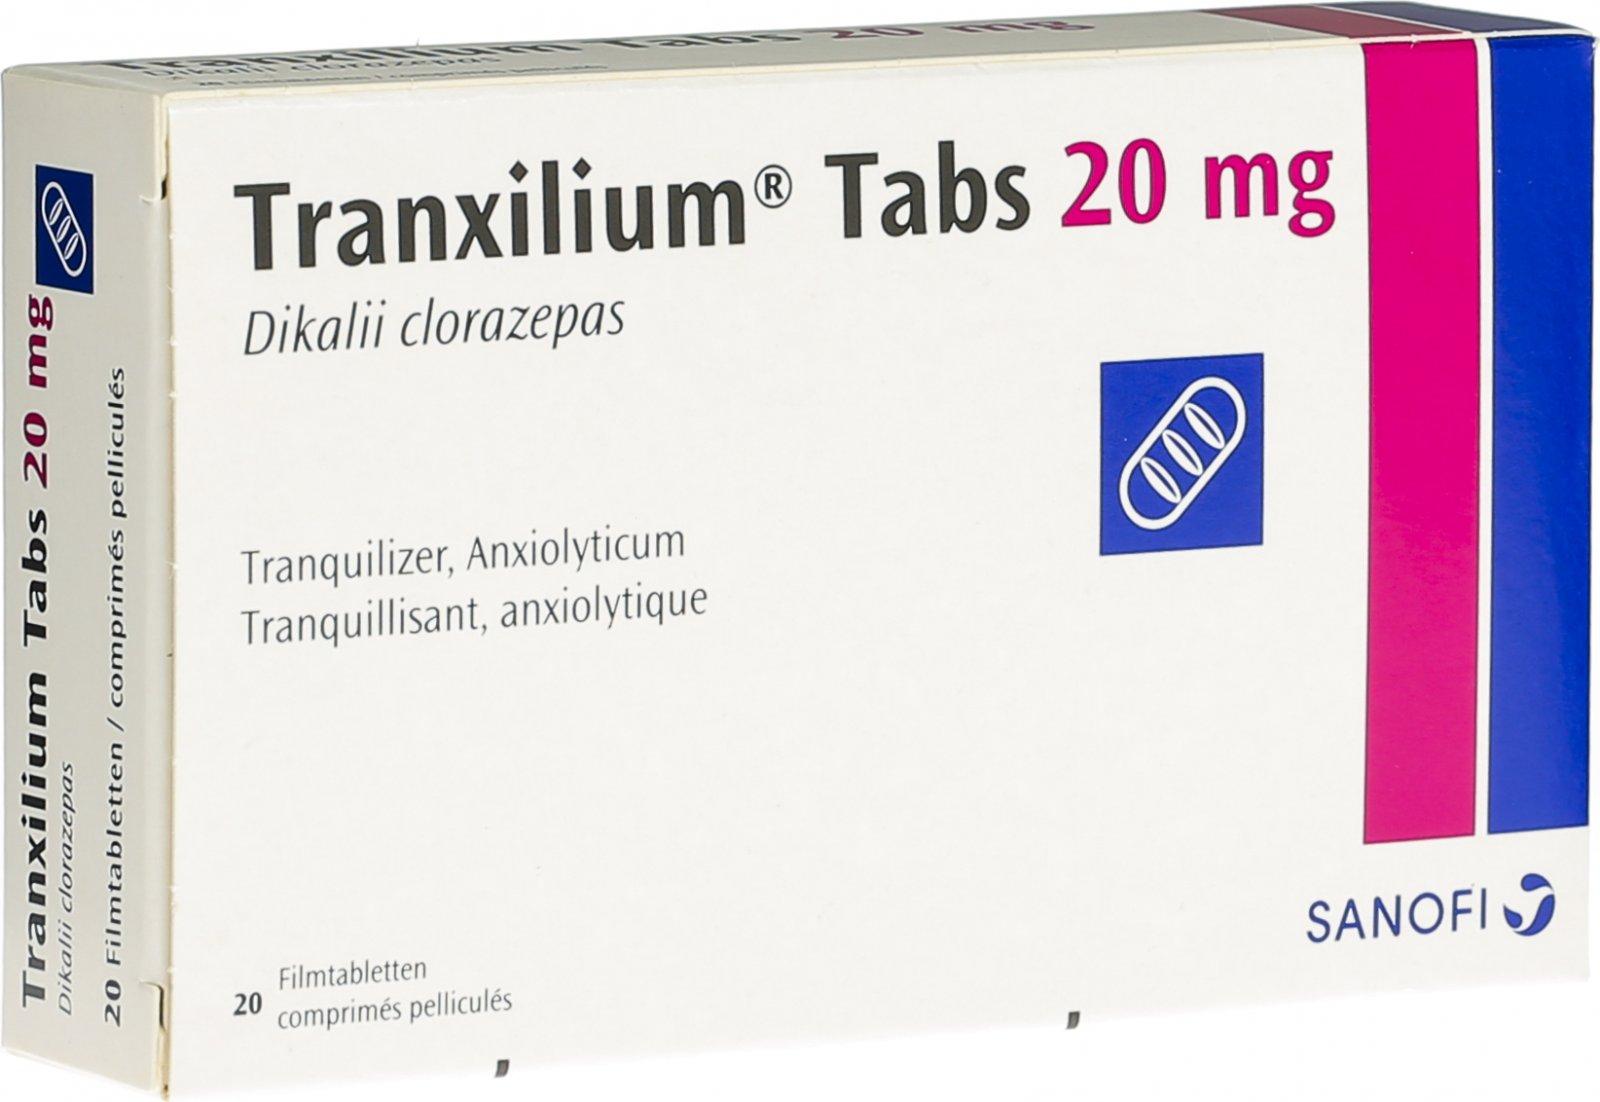 Tranxilium Tabs Filmtabletten 20mg 20 Stück In Der Adler Apotheke